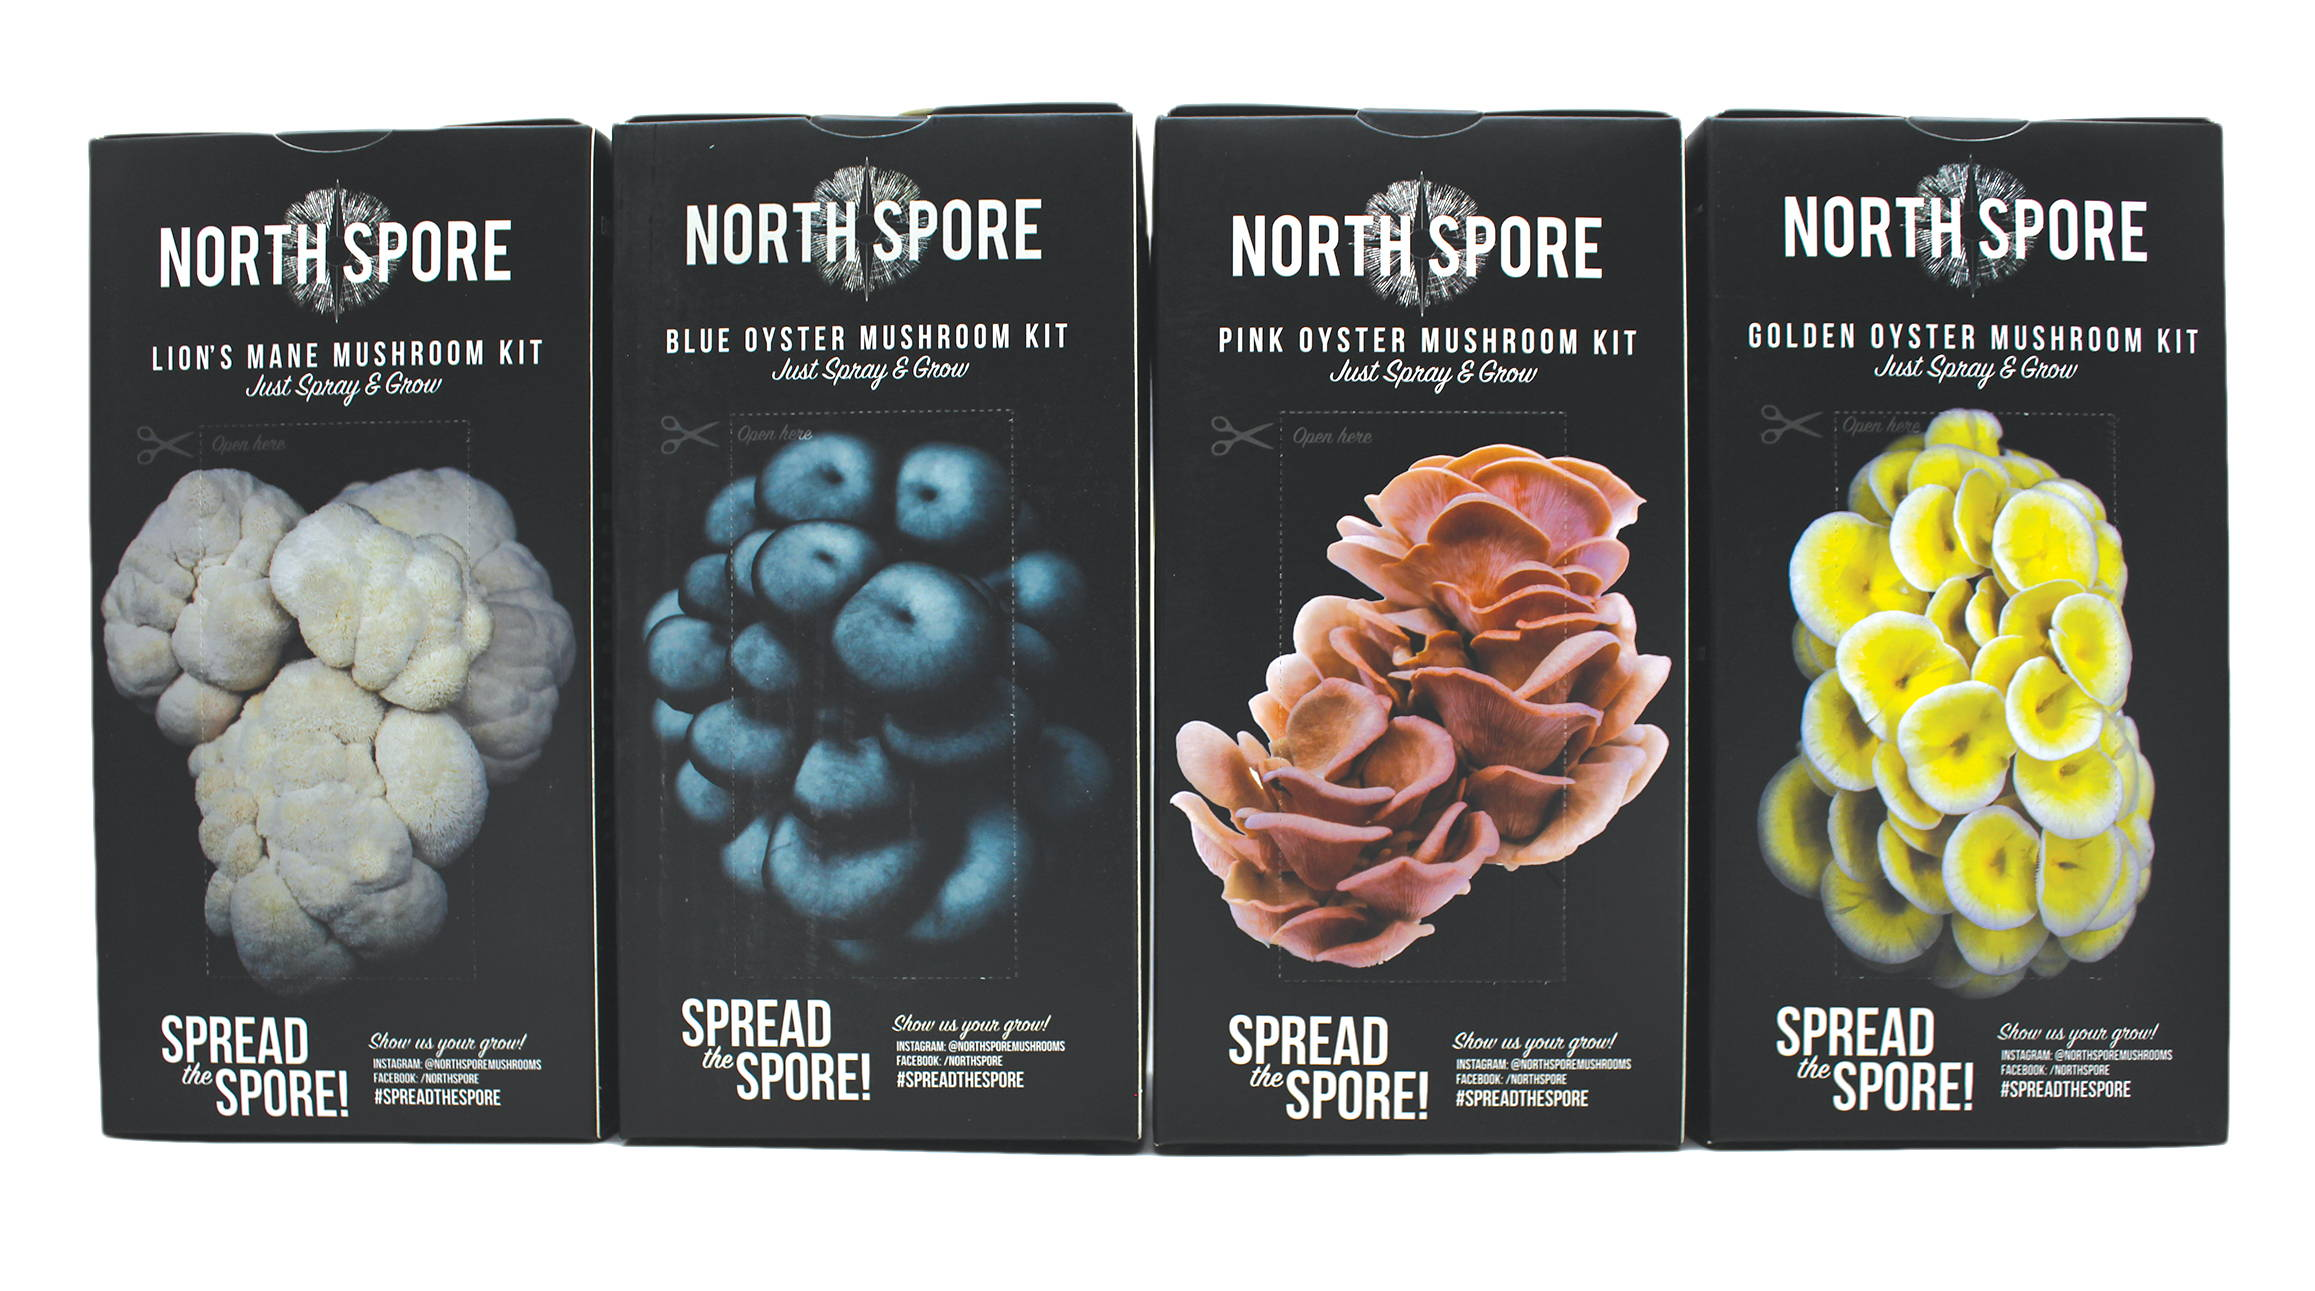 spray and grow mushroom kits